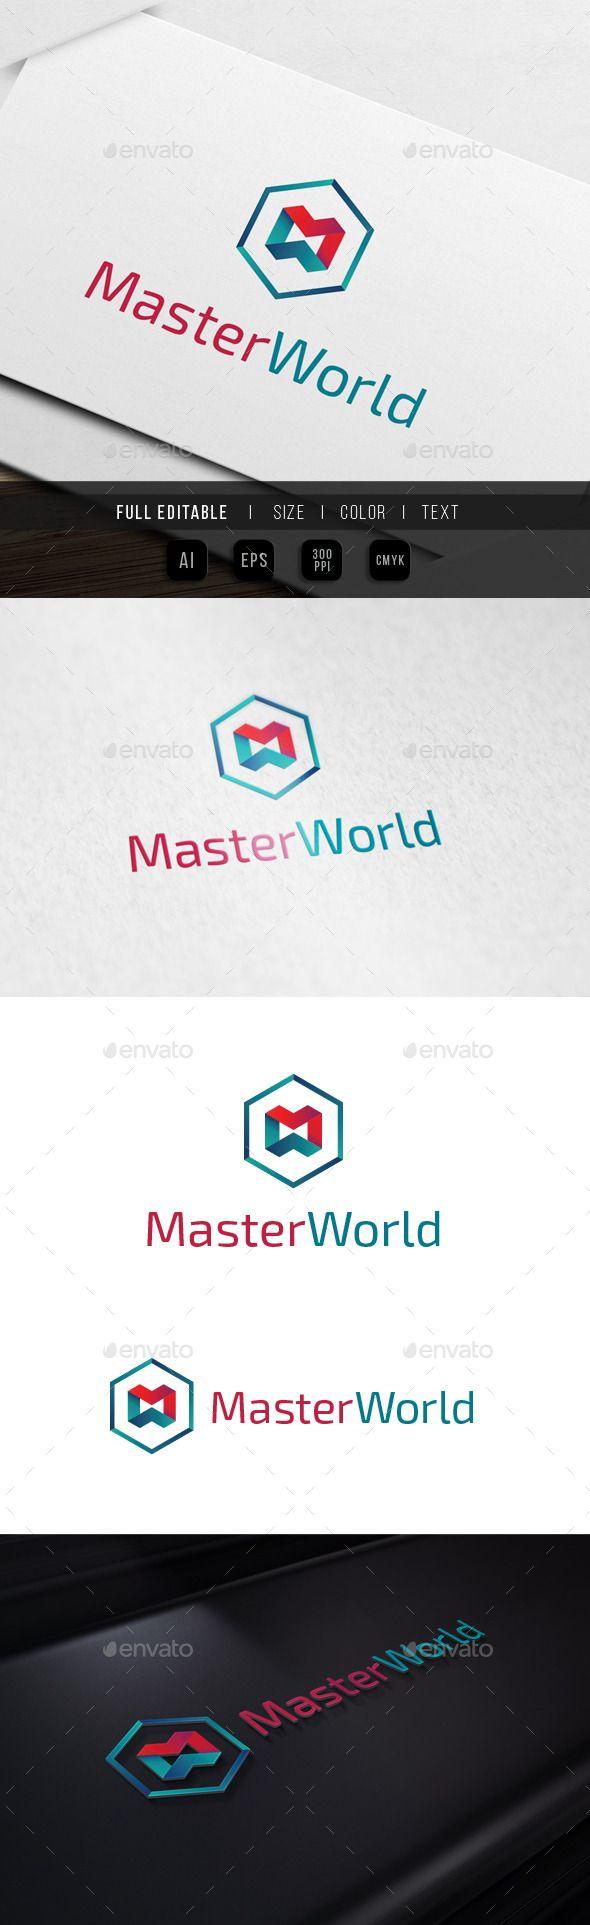 Master World  M W Hexagon — Vector EPS #hexa #web • Available here → https://graphicriver.net/item/master-world-m-w-hexagon/10023219?ref=pxcr